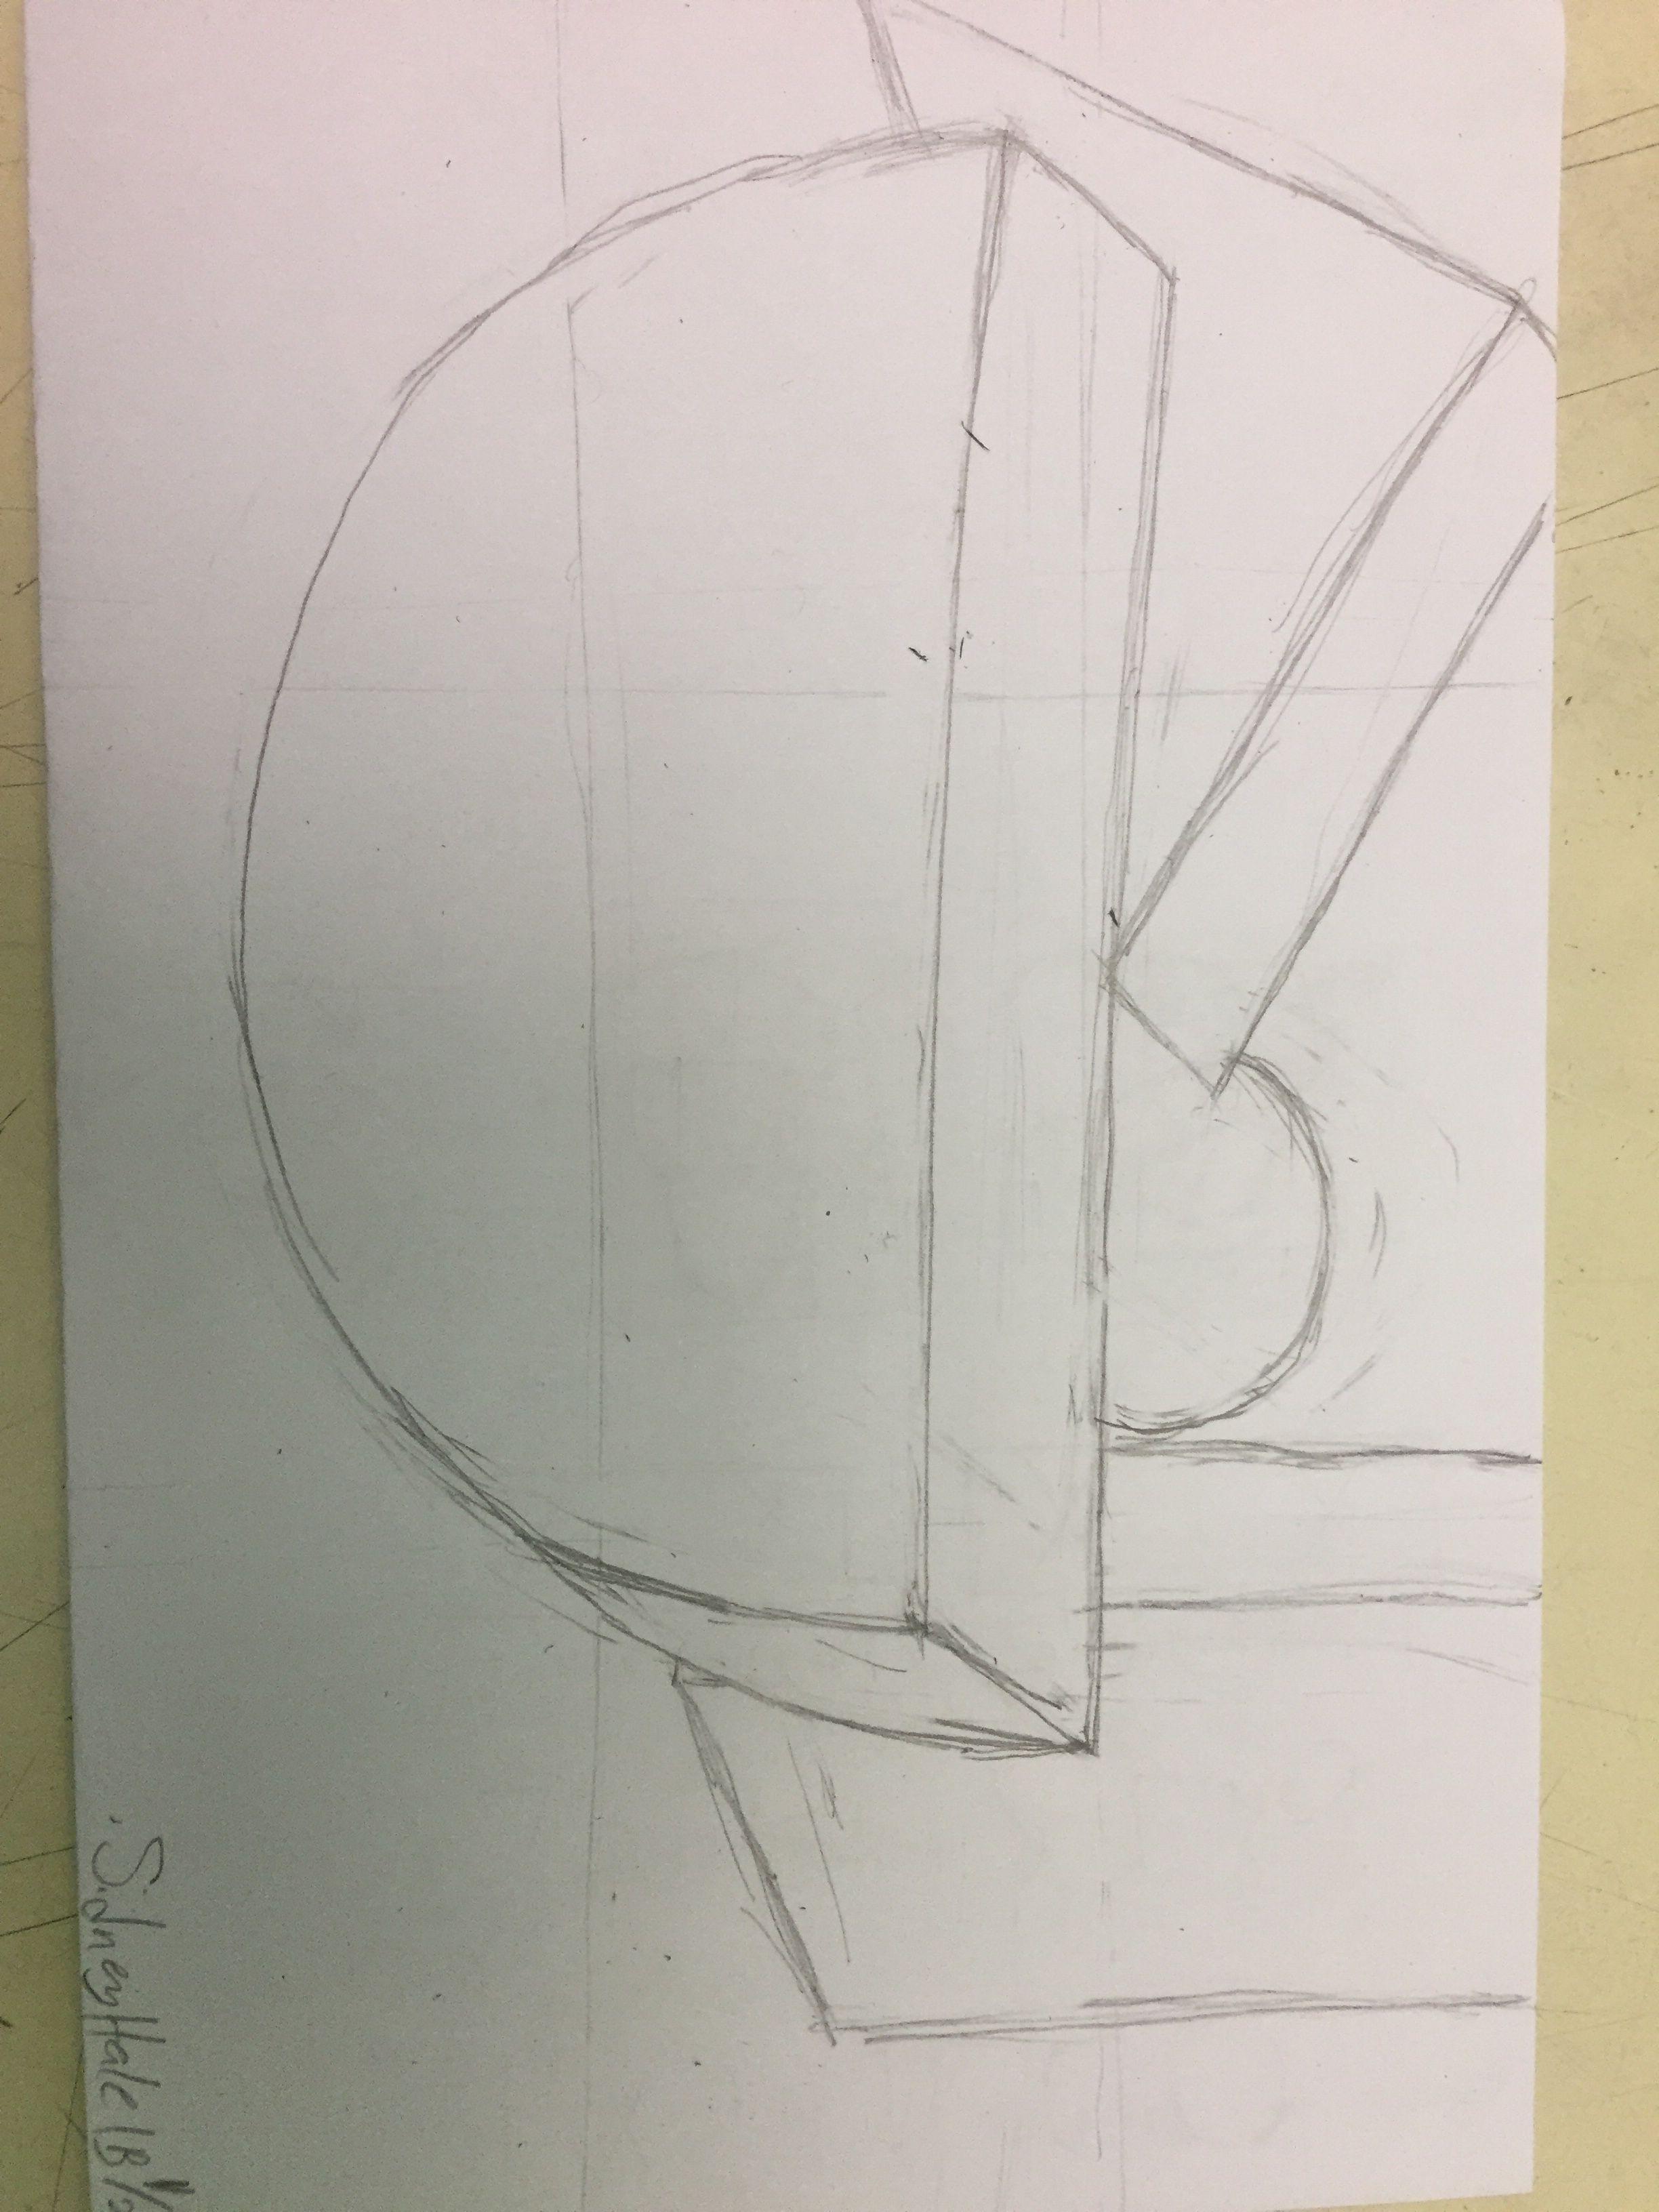 Still life wood block drawing 1/23/18